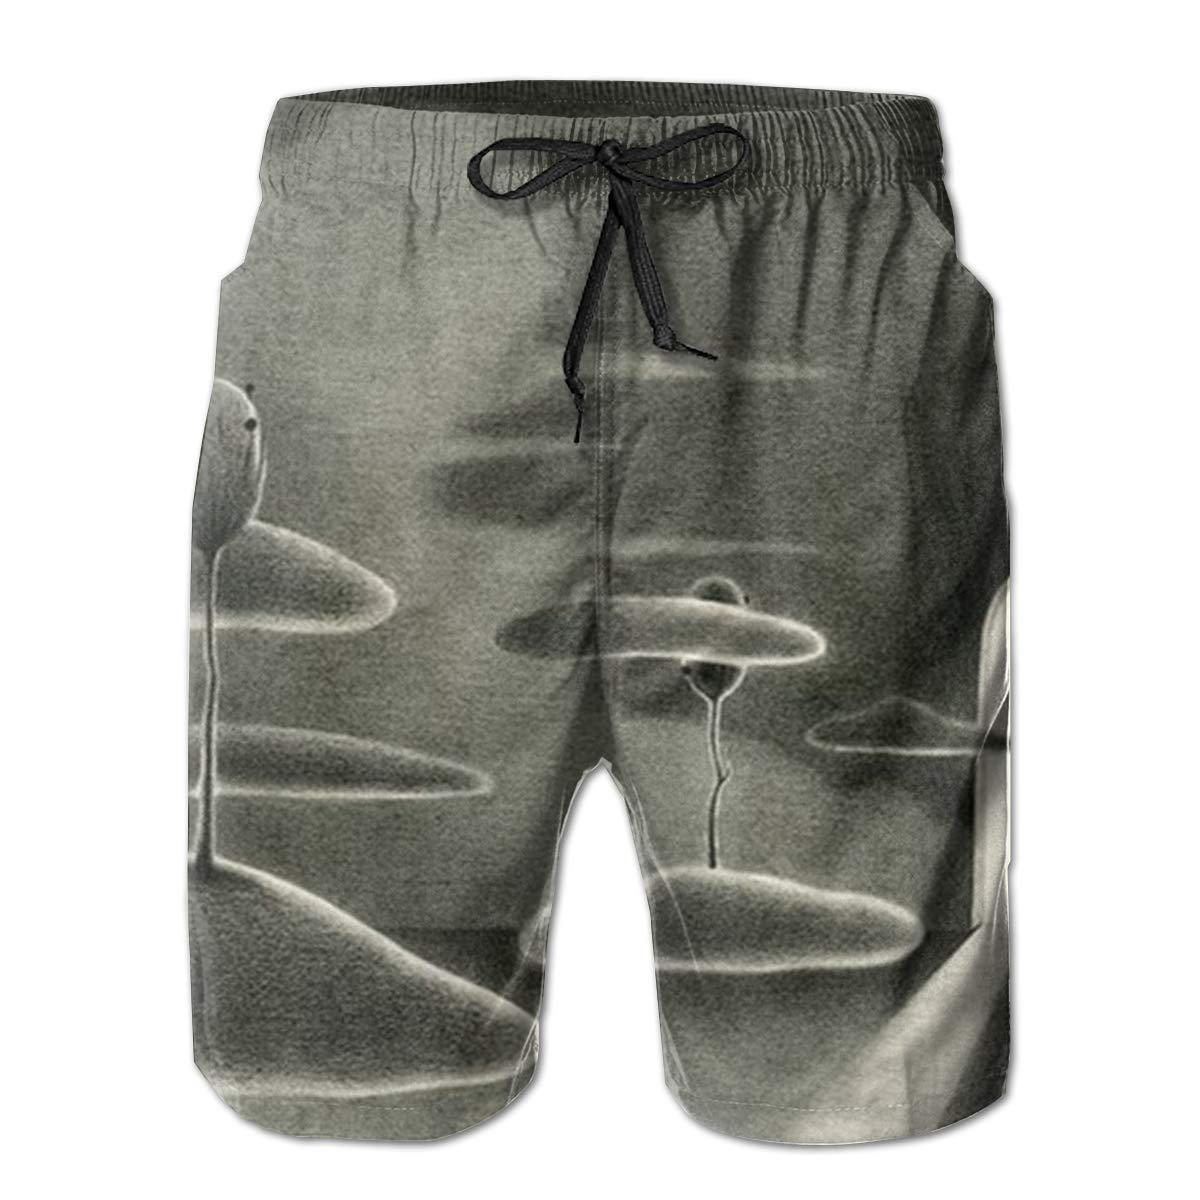 Surprised Cat Men/â/€s Beach Board Shorts Quick Dry Swim Truck Shorts